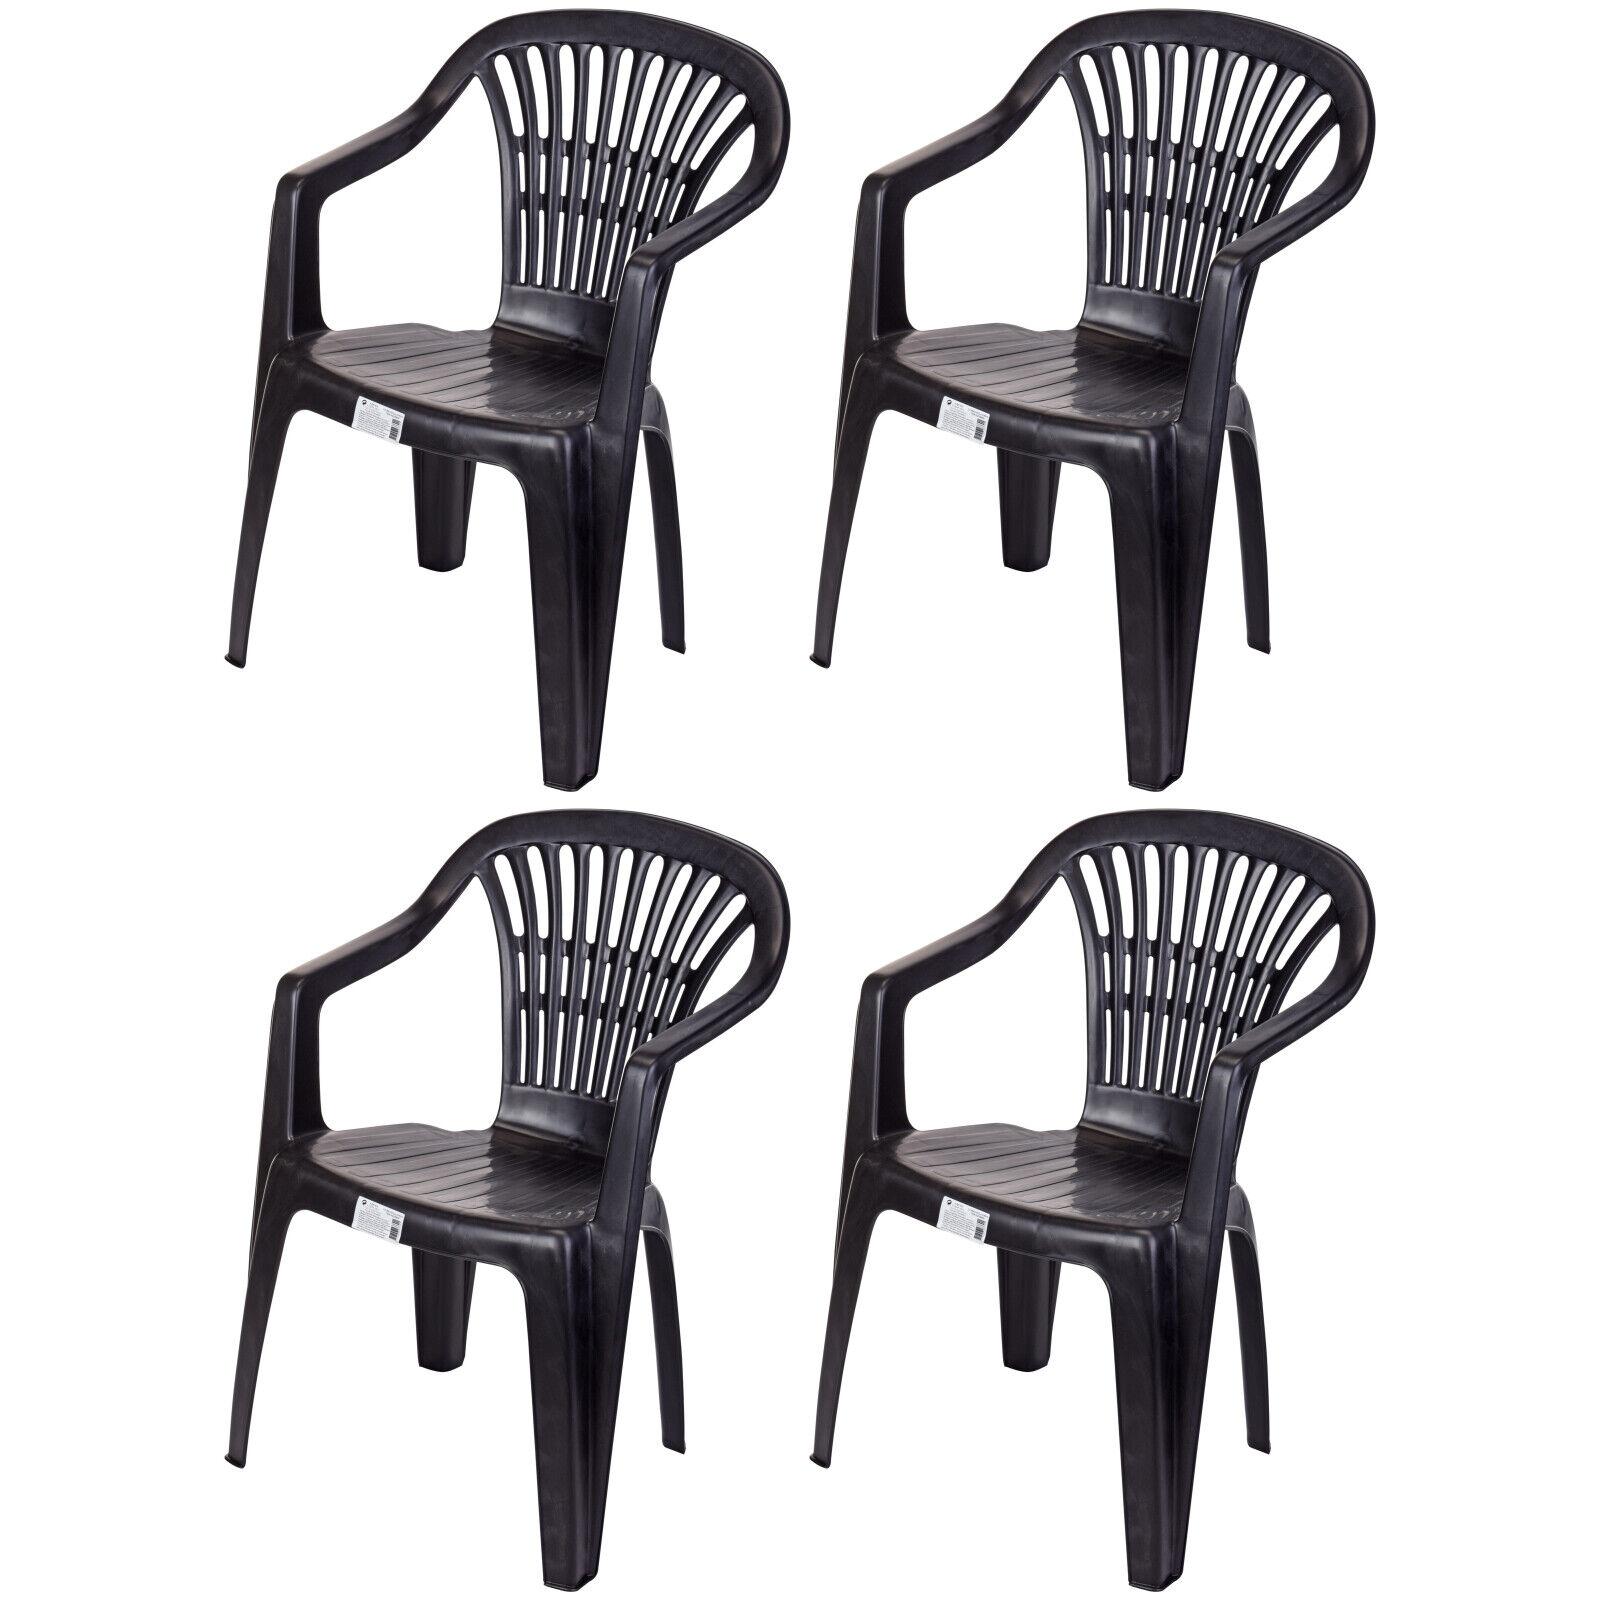 4x Gartenstuhl Bistrostuhl Balkonstuhl Stapelstuhl Stuhl Kunststoff Schwarz 0820